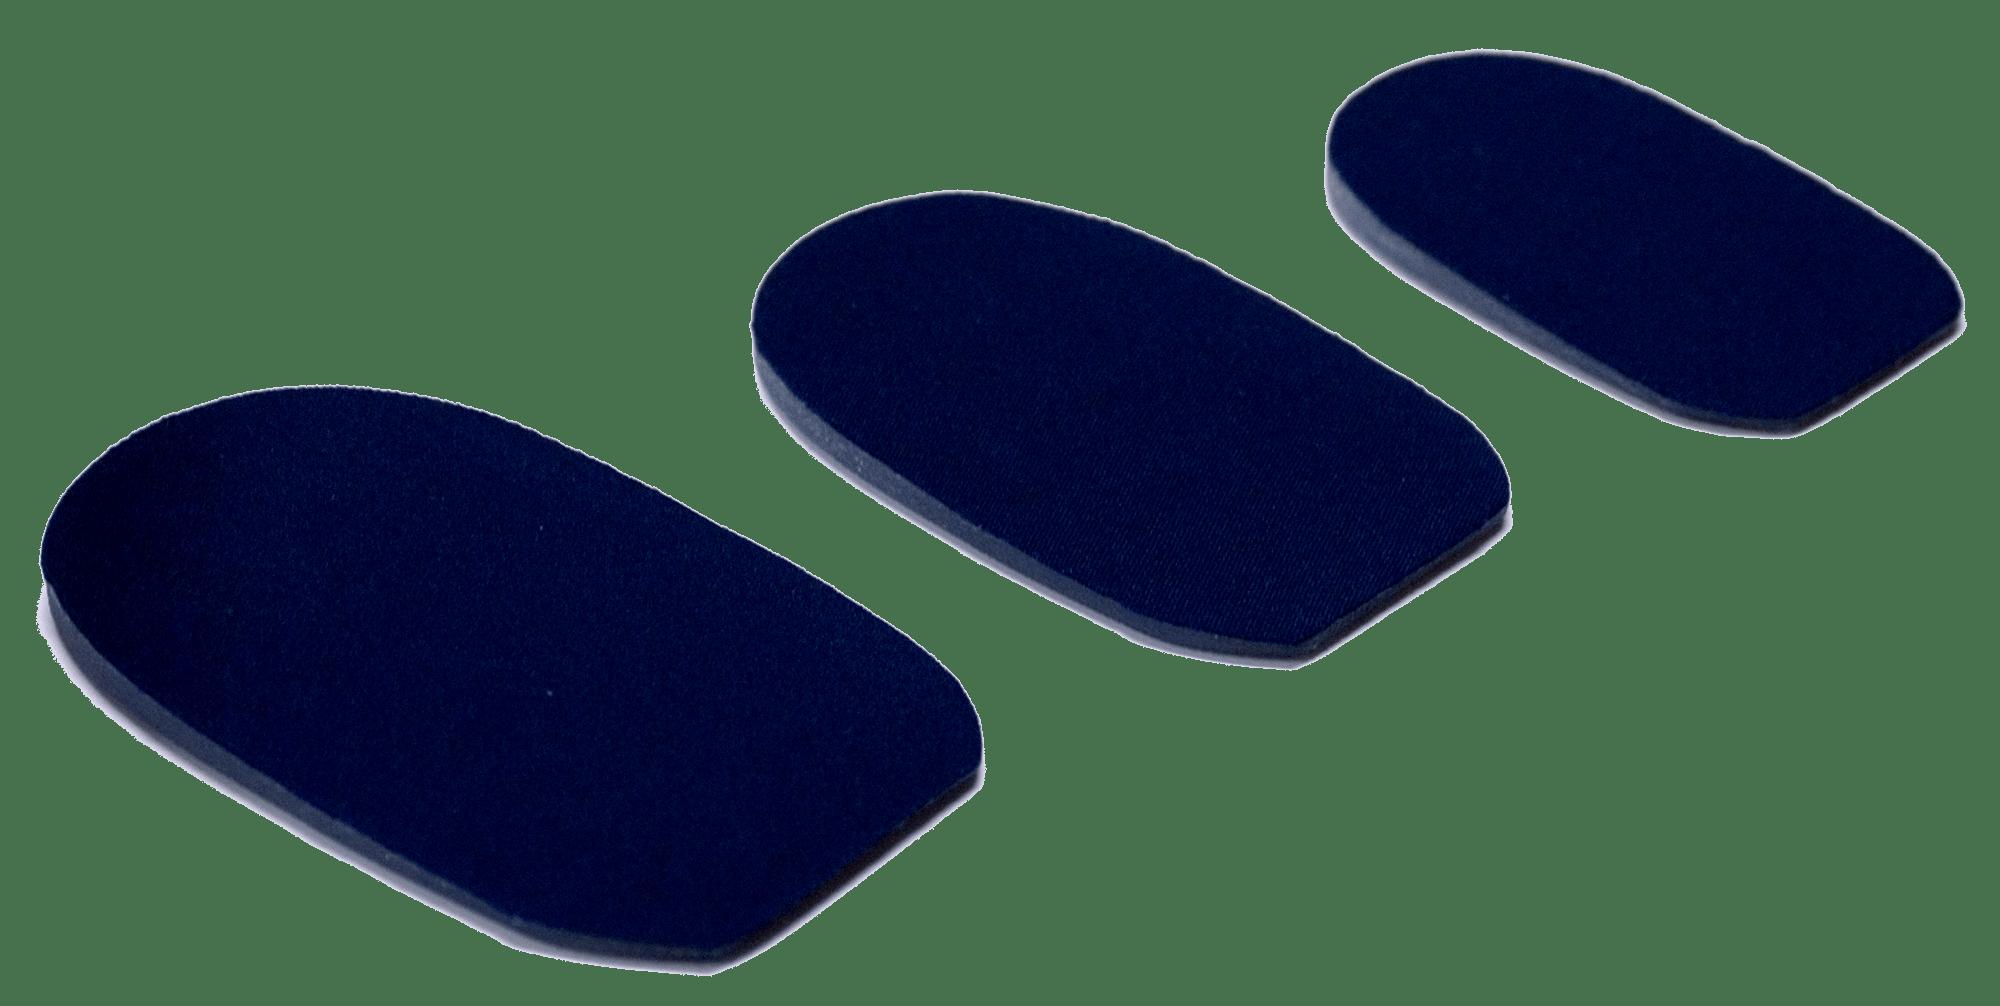 Bunga Anti-Shock Healwedge with Cover